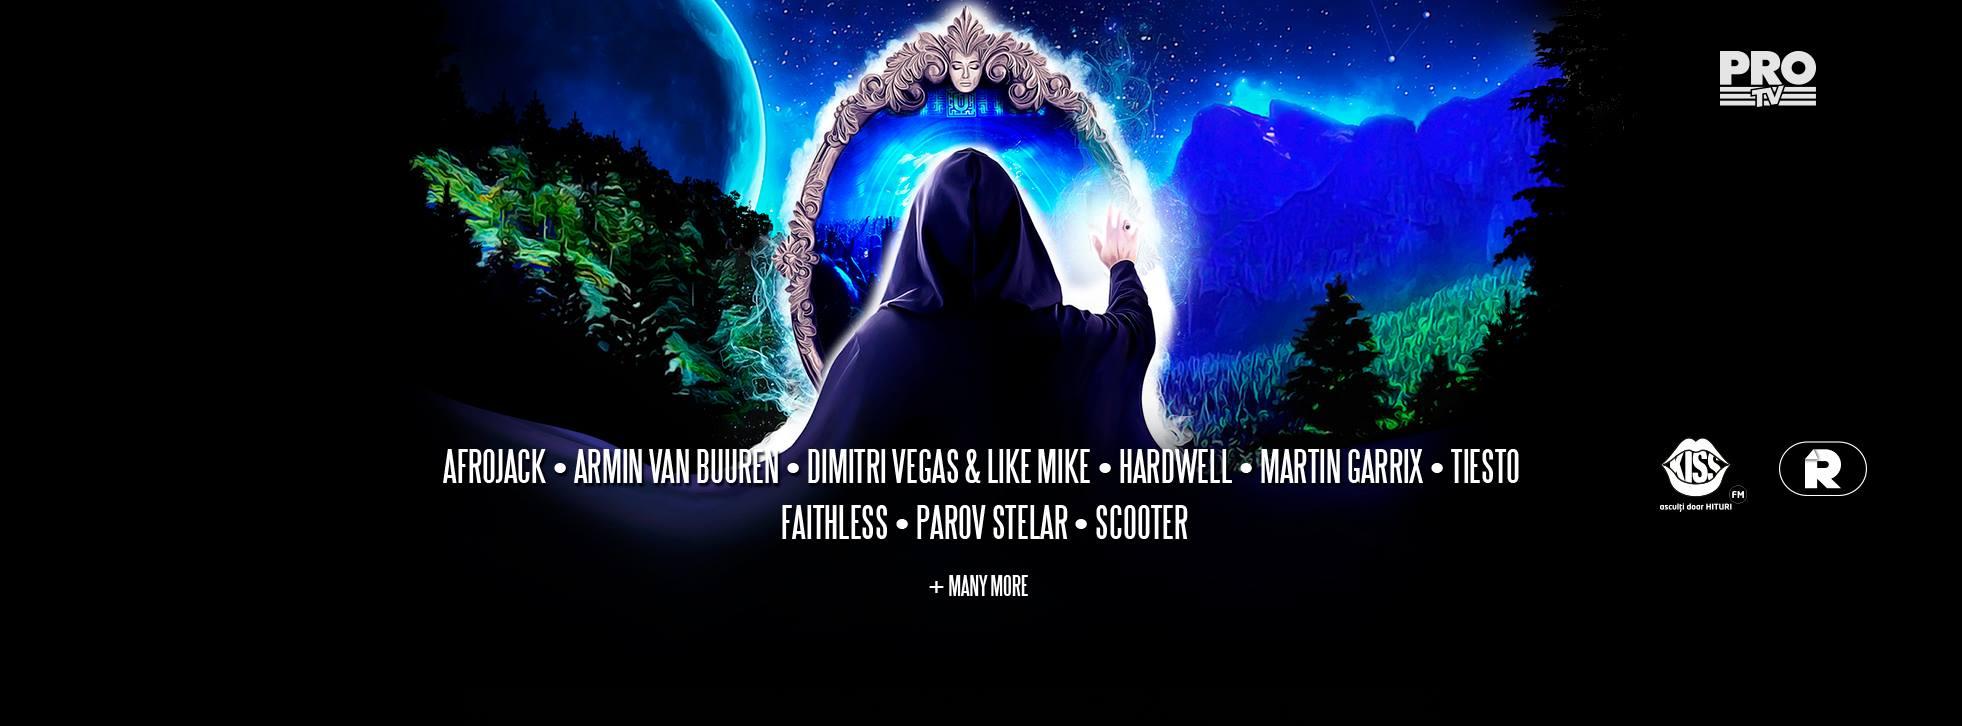 Chase and Status DJ Set, Dub Fx, Netsky DJ Set, Pendulum & Verse DJ Set, Rudimental, LTJ Bukem + others la  UNTOLD Festival 2016